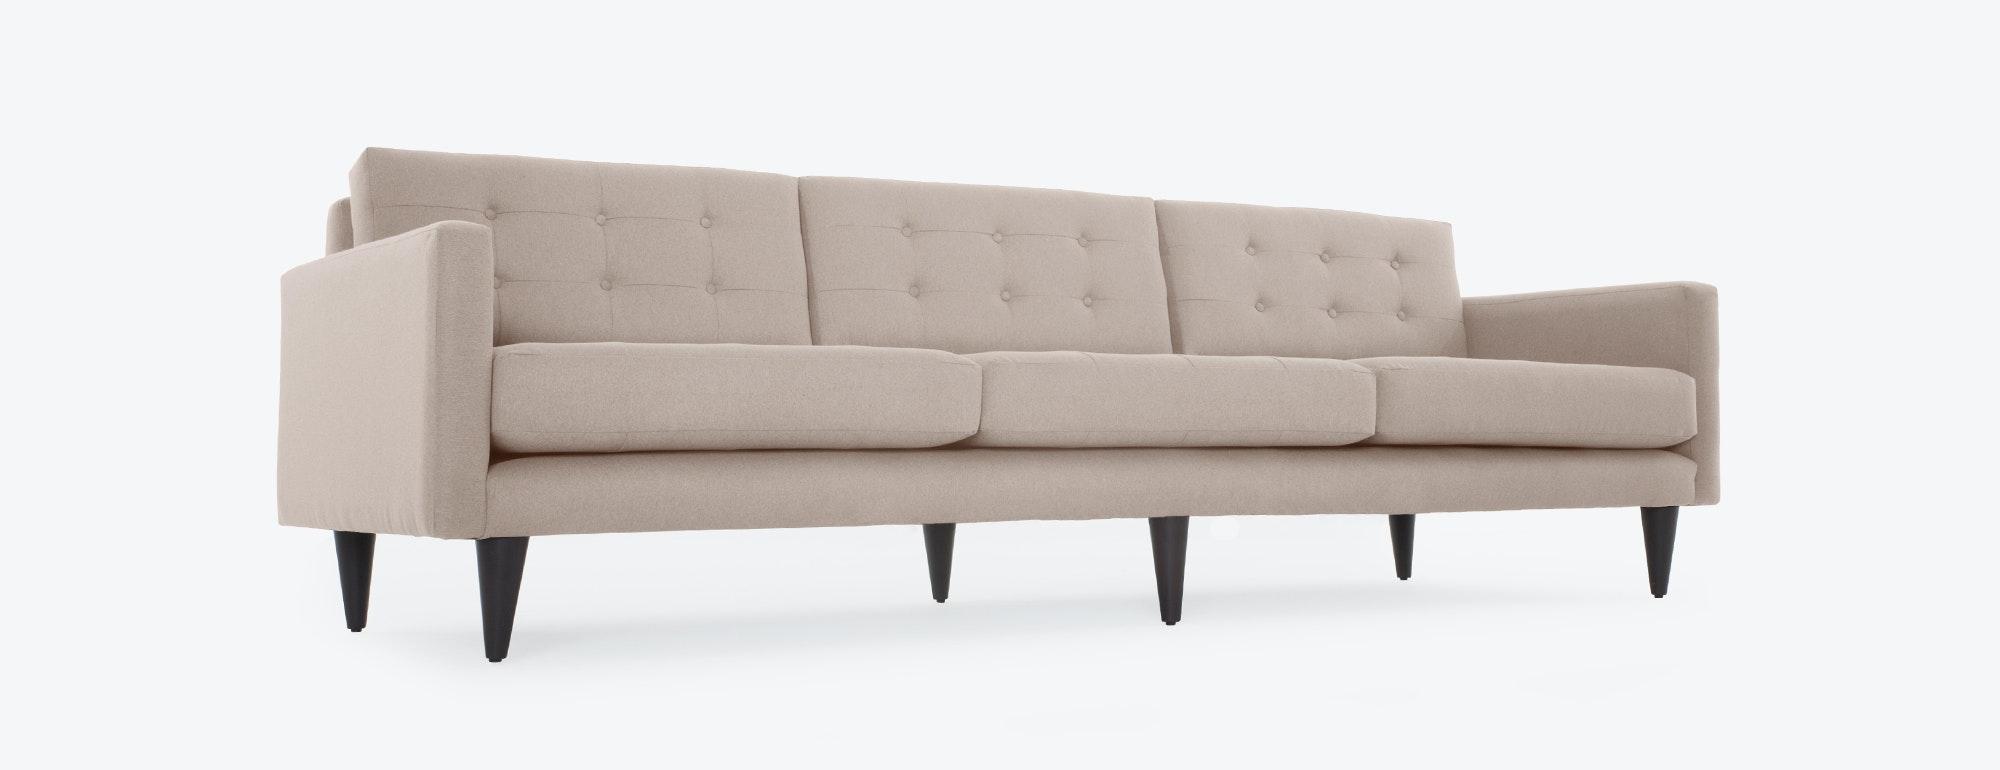 grand sofa kelly hoppen throws eliot joybird